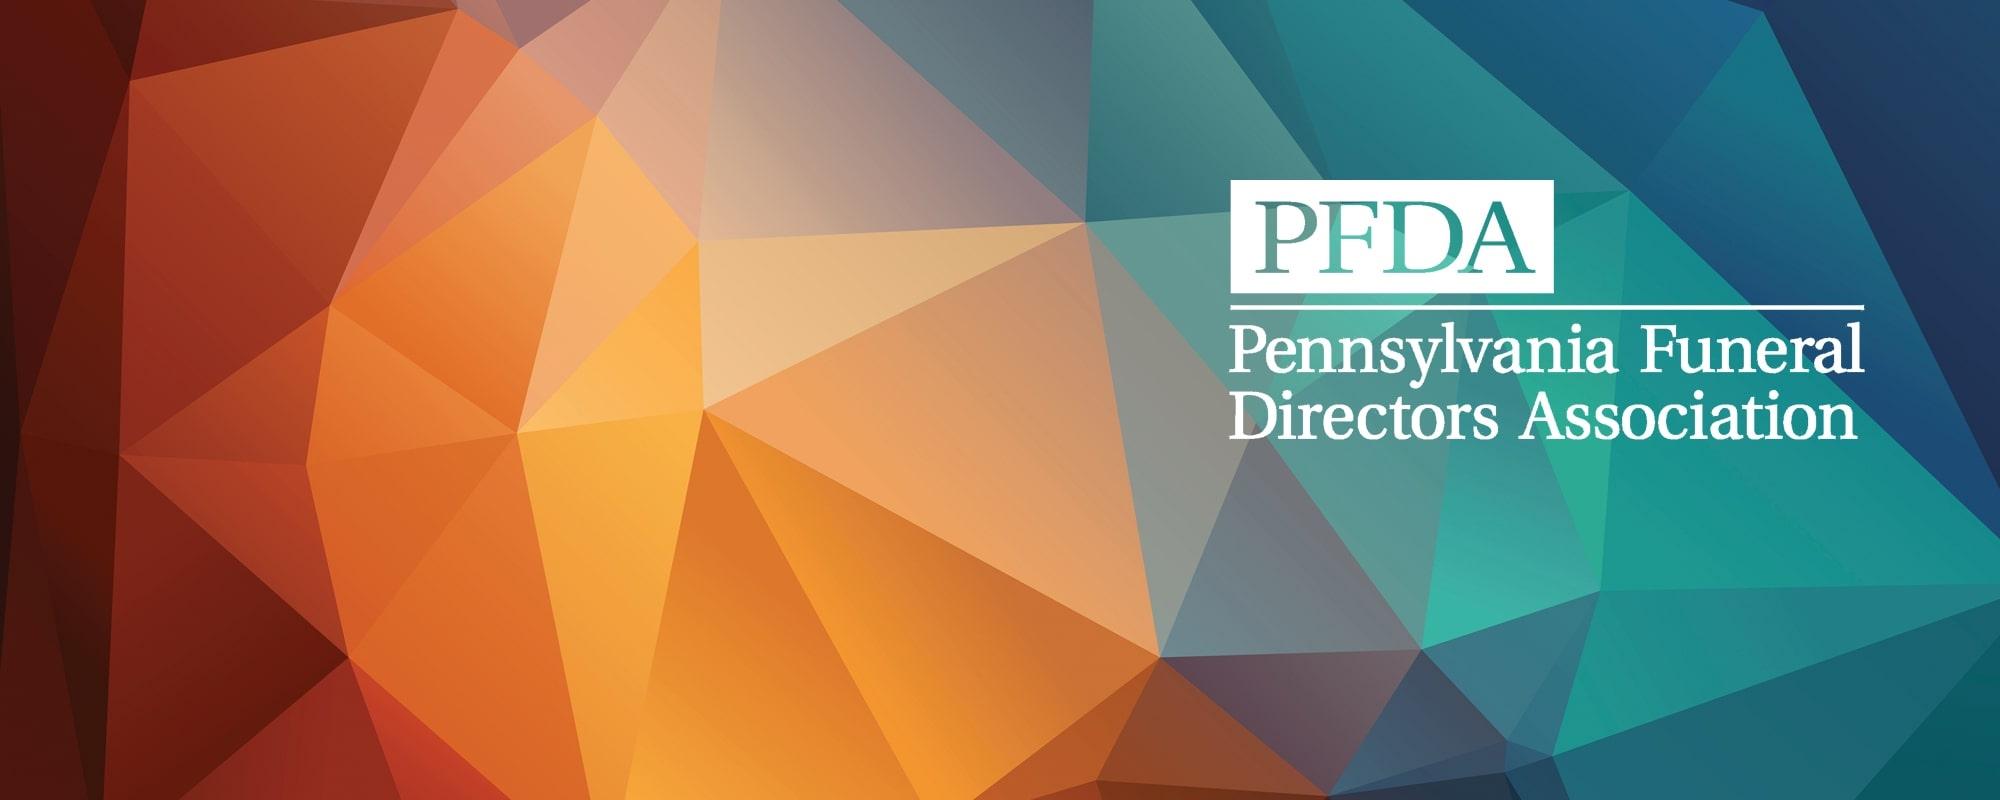 PFDA geometric background